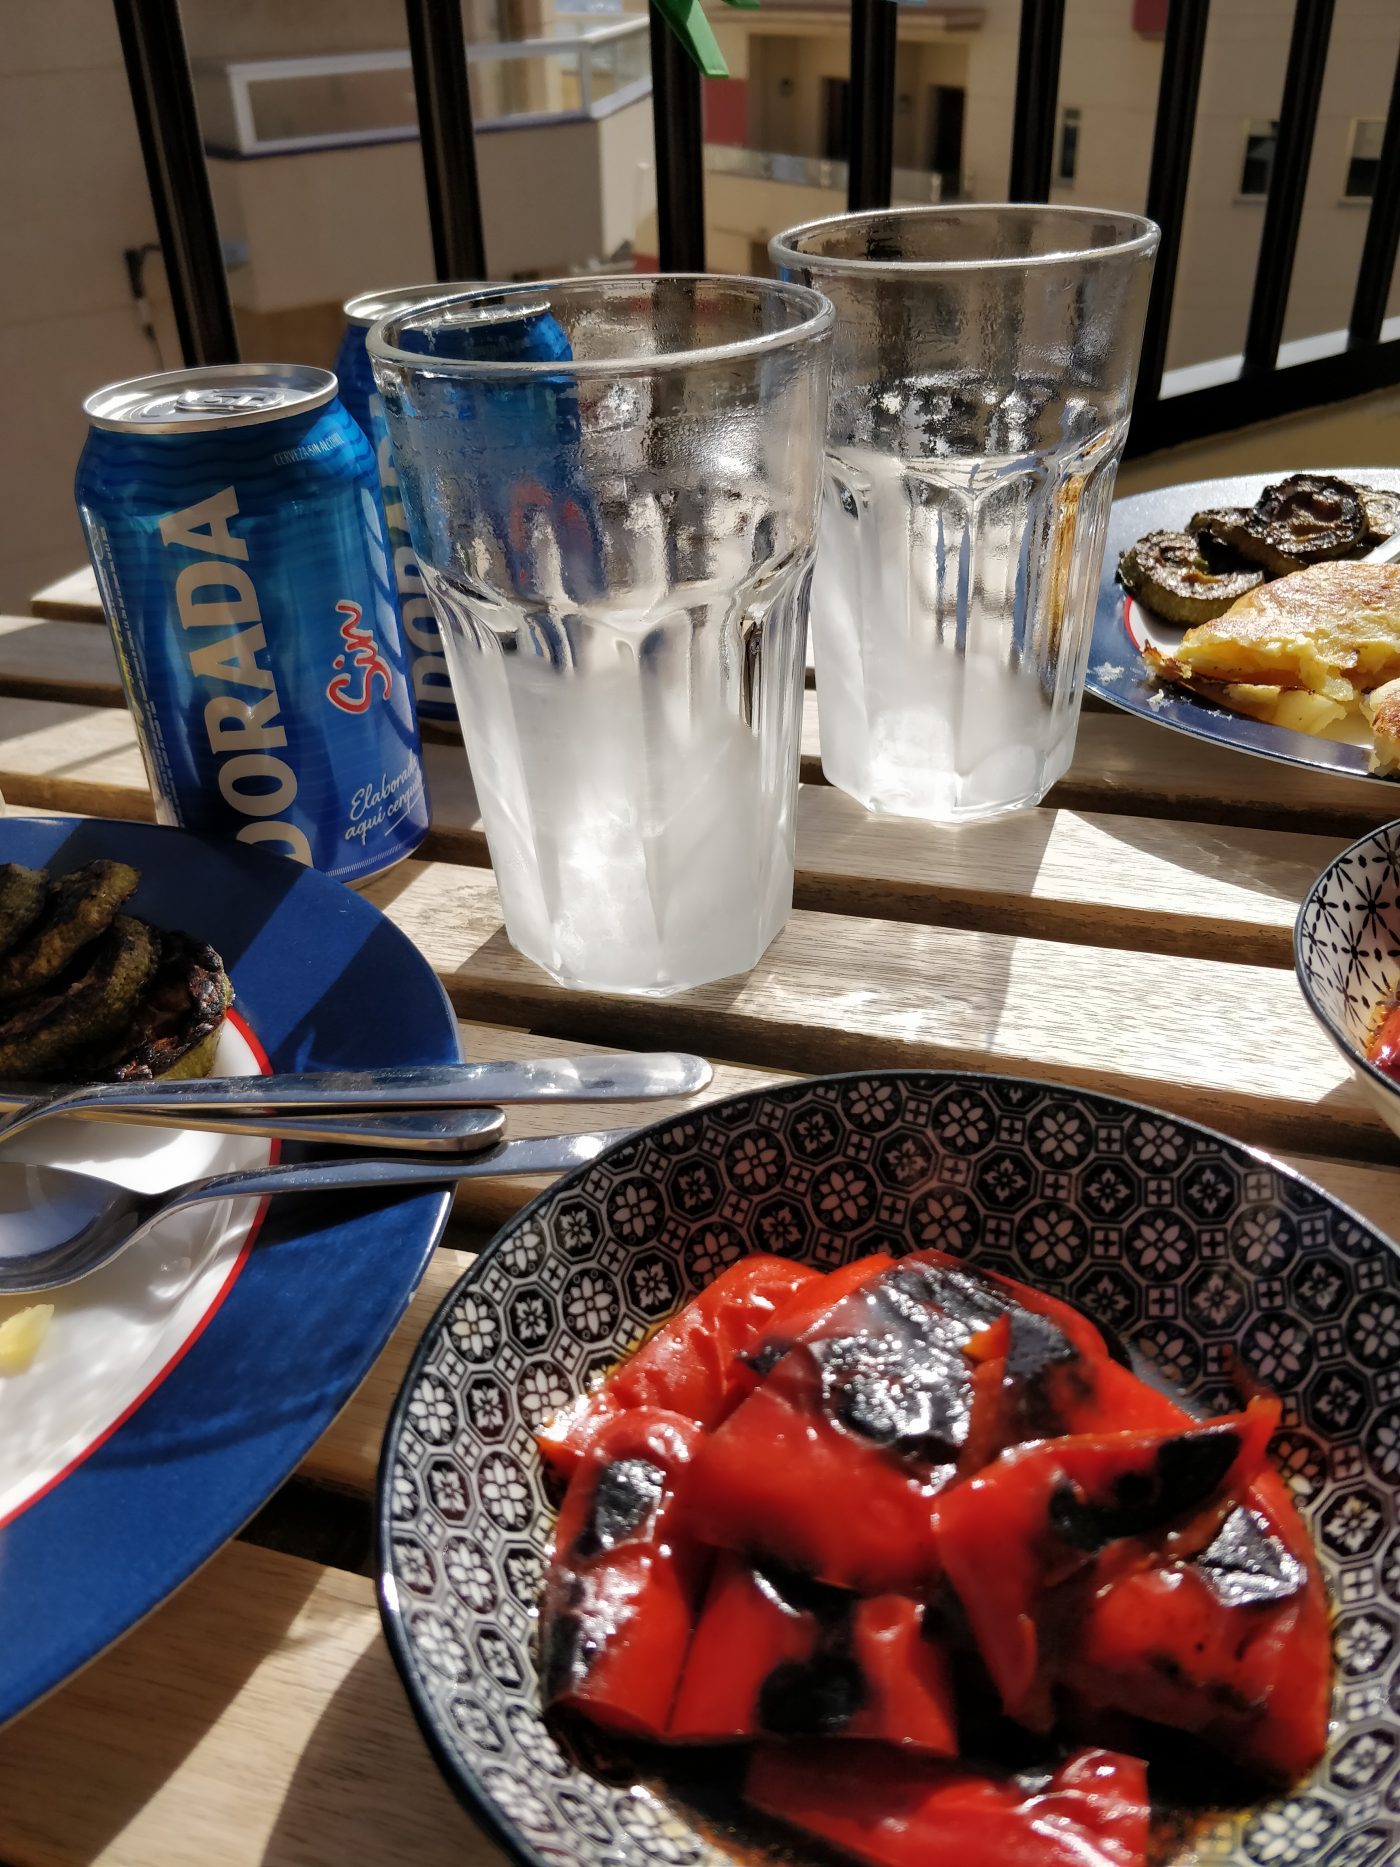 Frokost i solen på altanen.